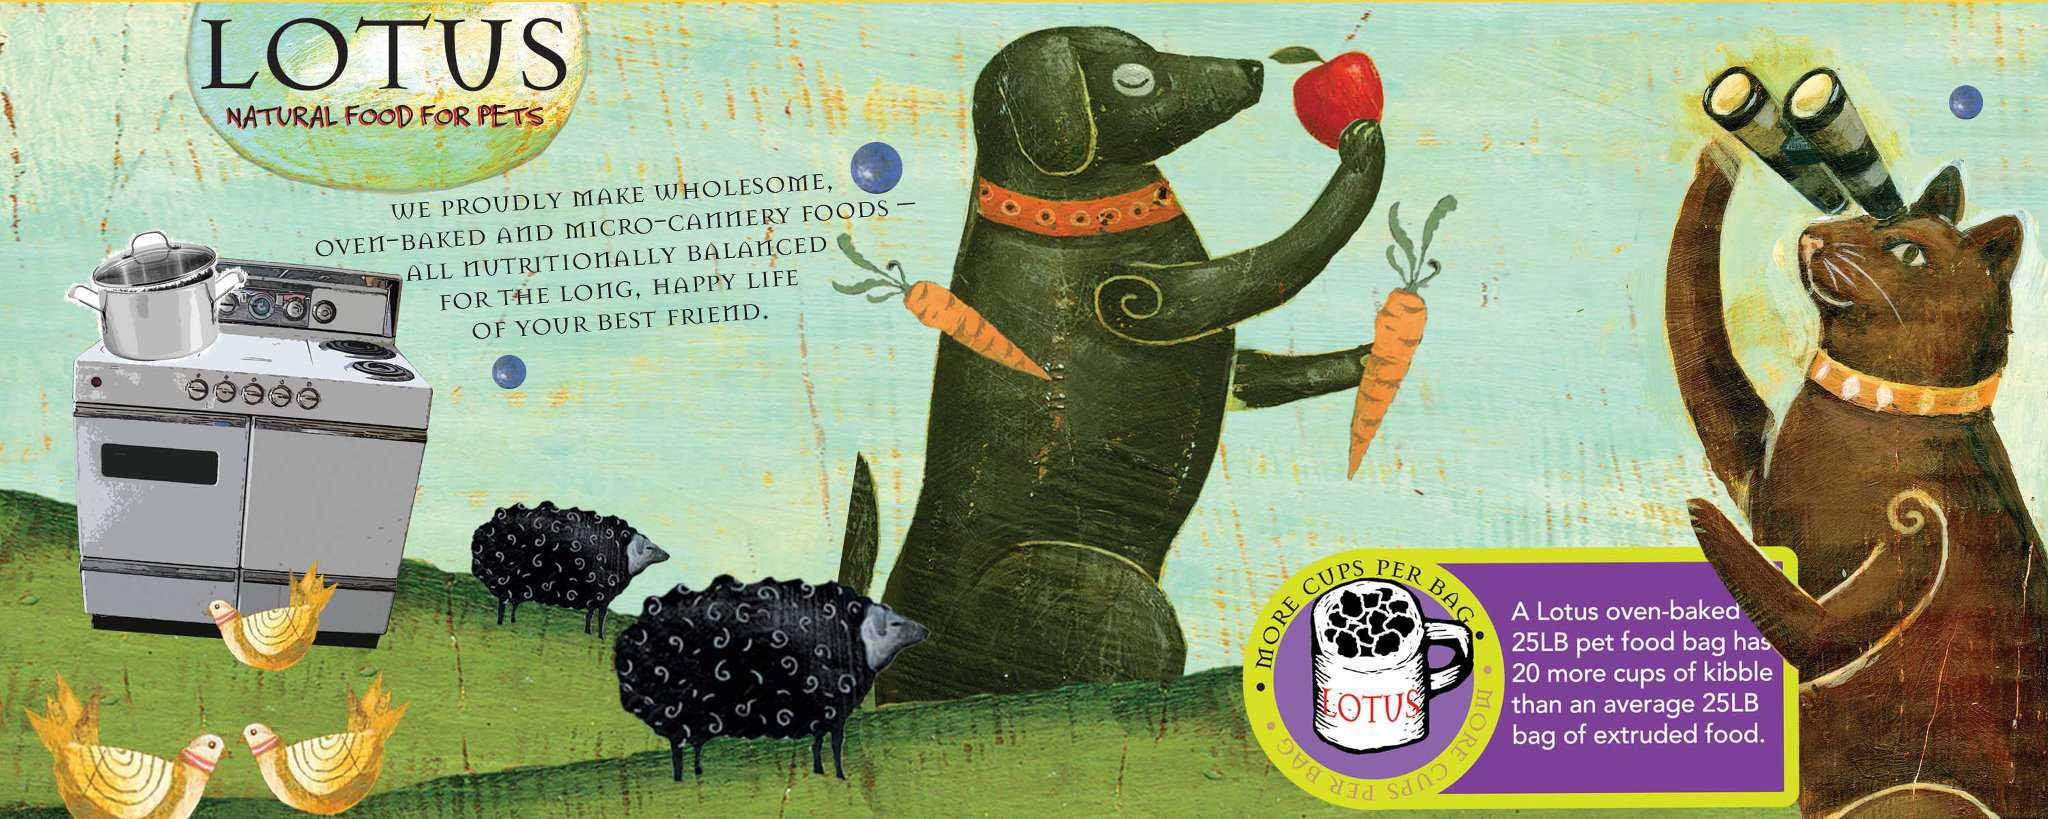 Lotus dog food review